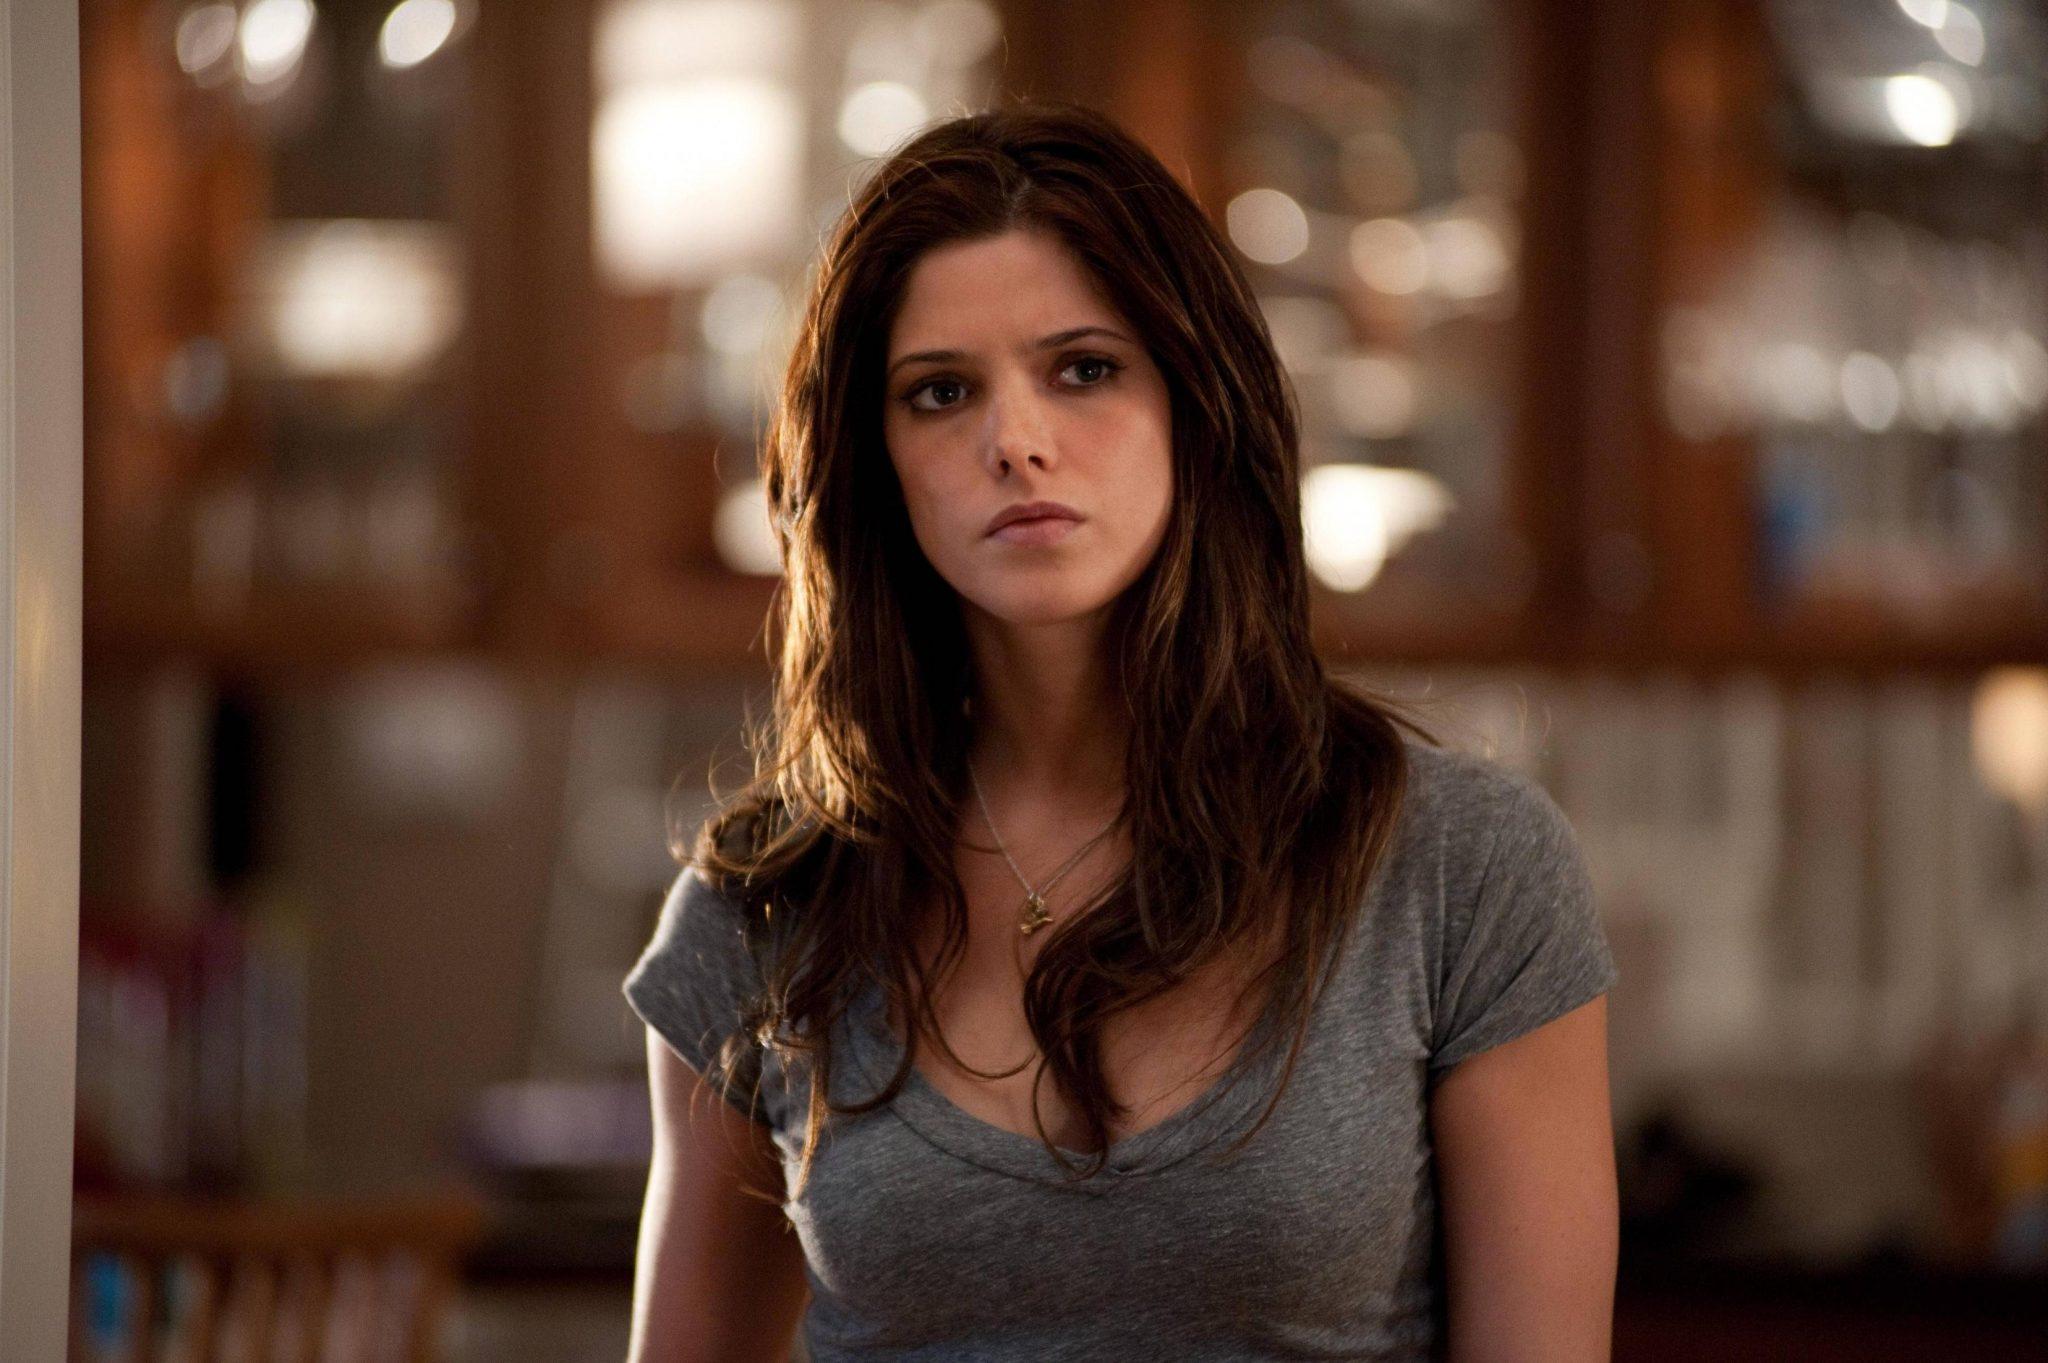 Melissa Benoist cast as Supergirl